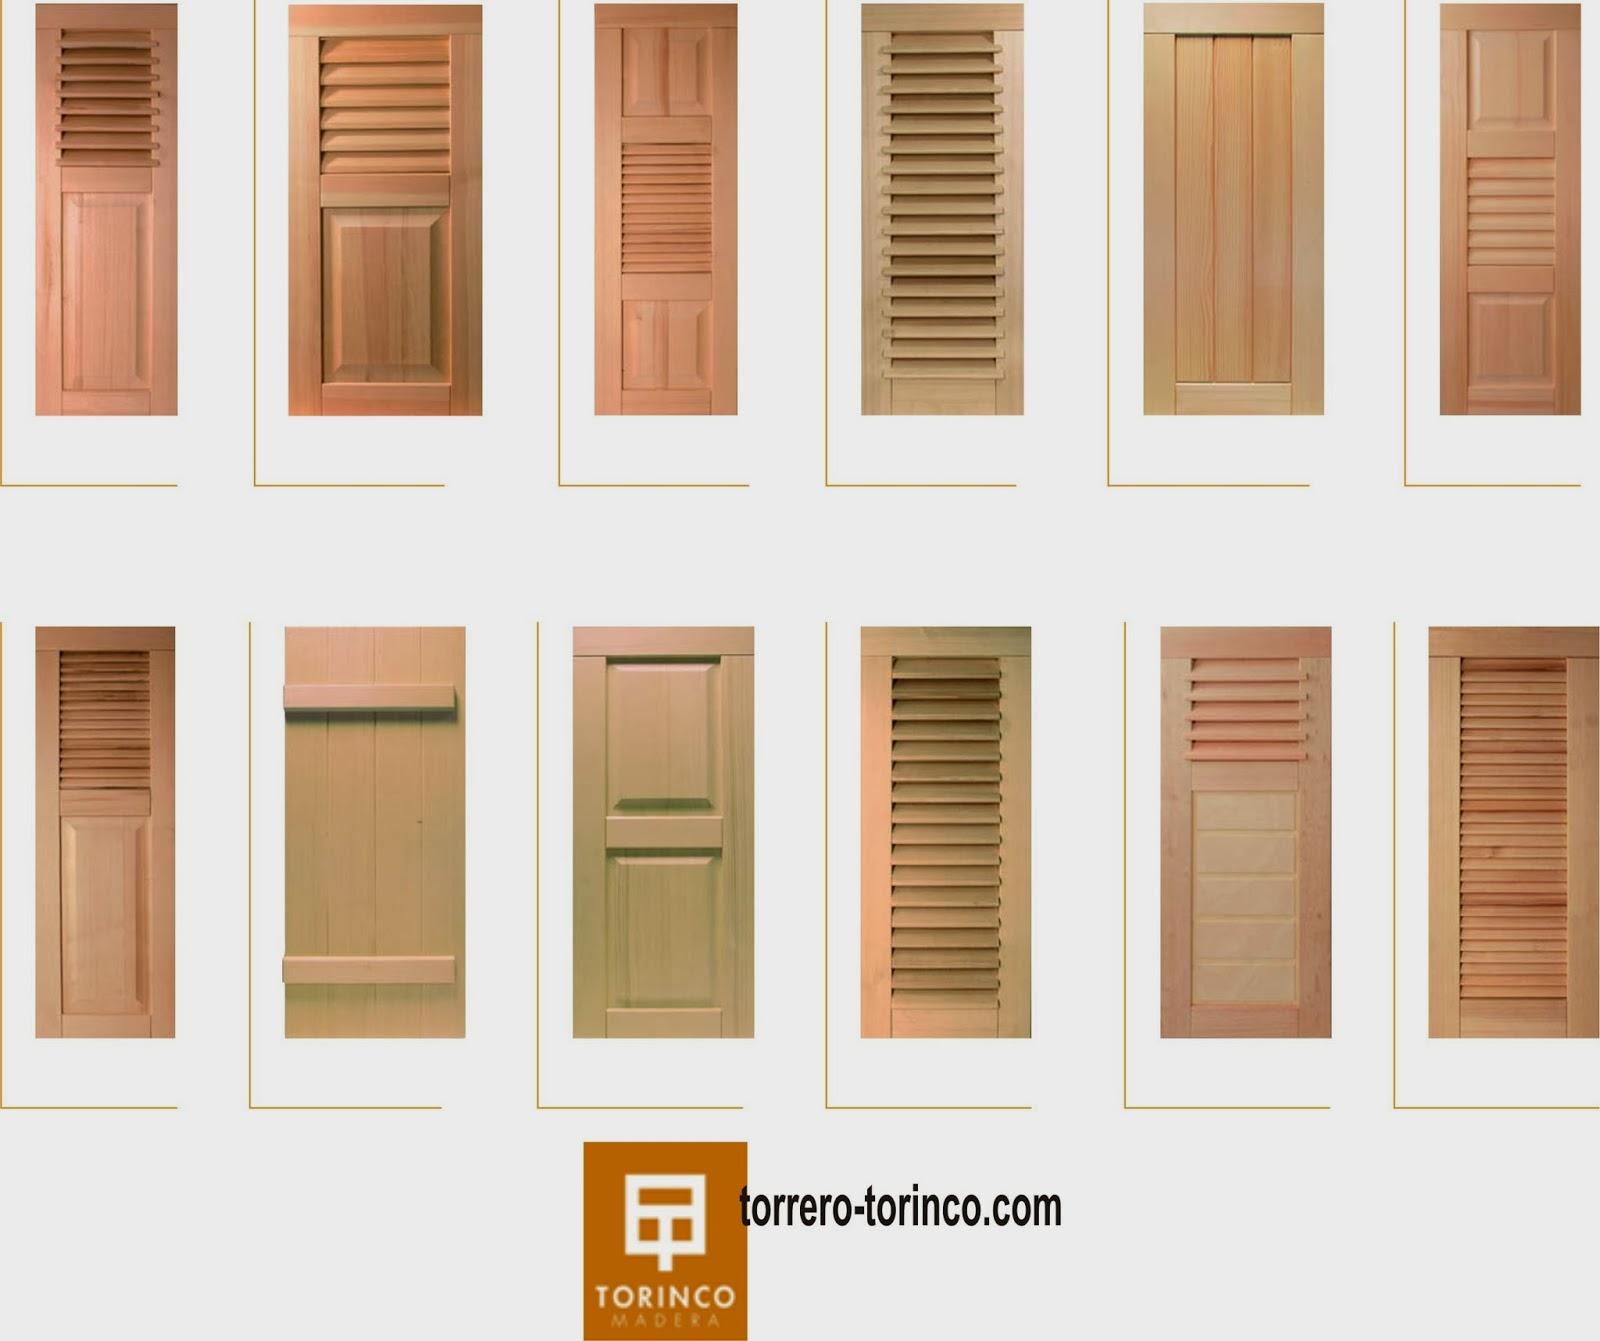 Ventanas mallorquinas madera materiales de construcci n for Porticones madera exteriores